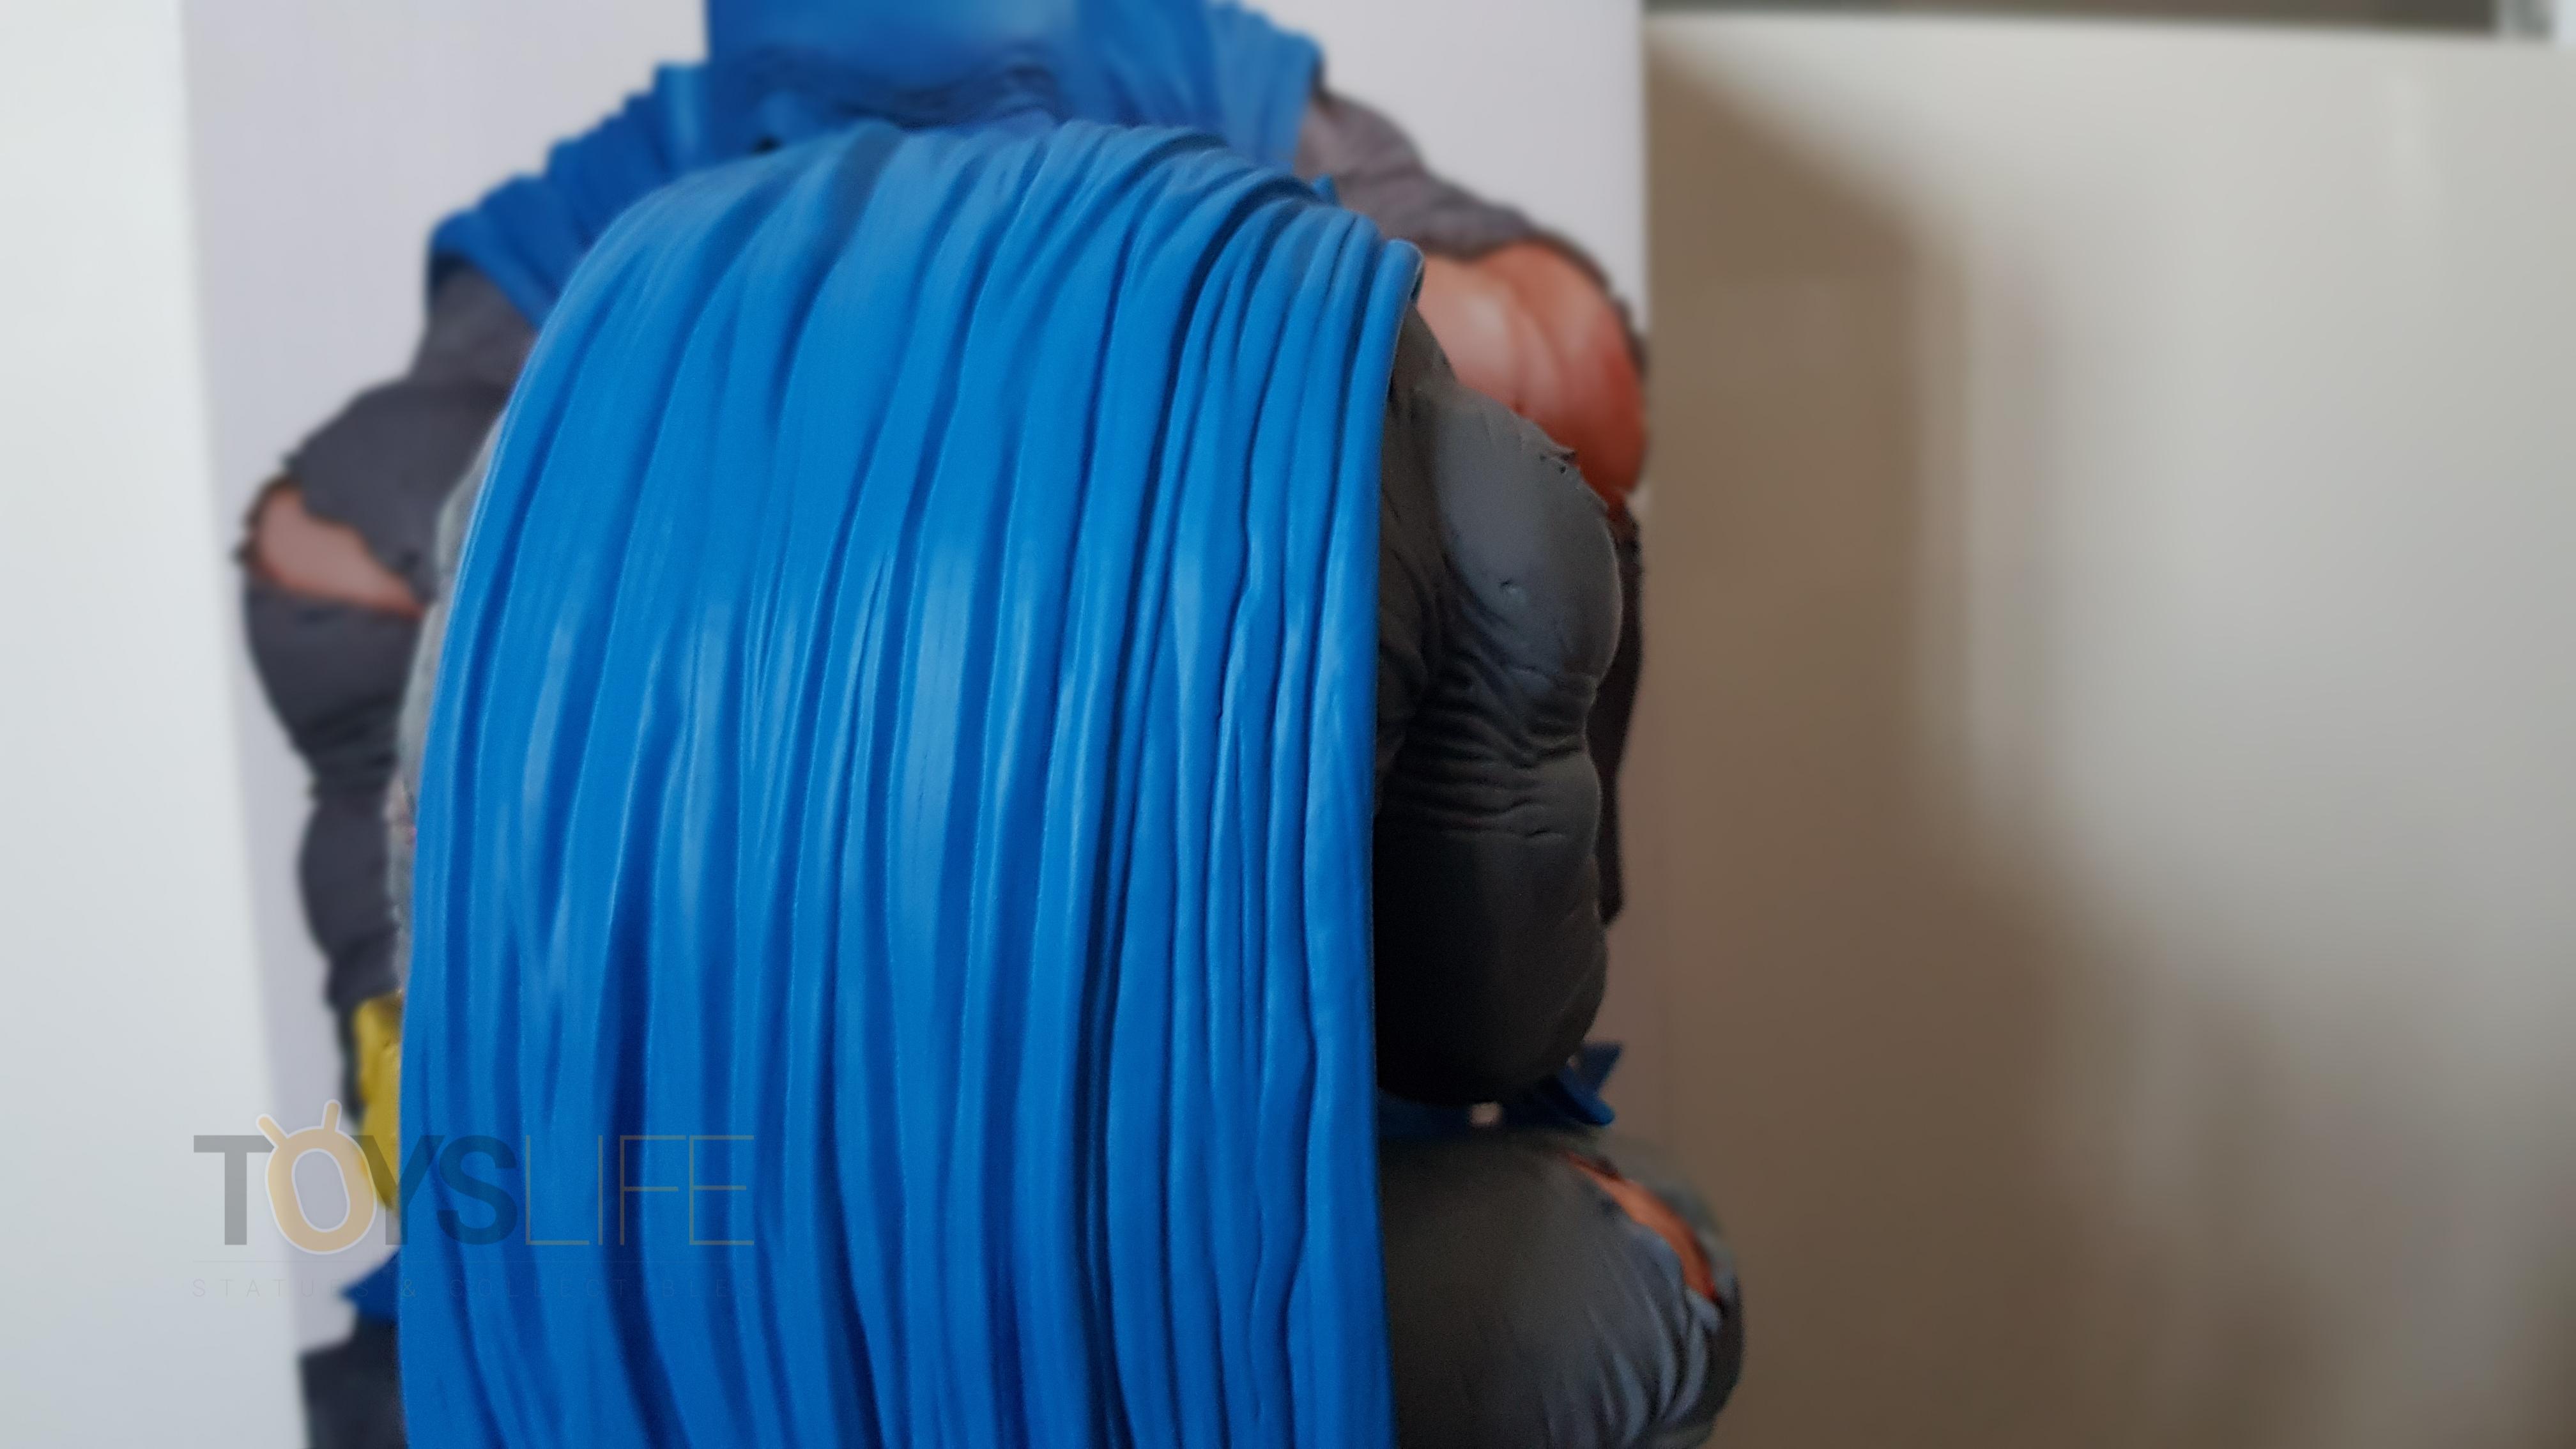 dc-designer-batman-by-frank-miller-statue-toyslife-review-11